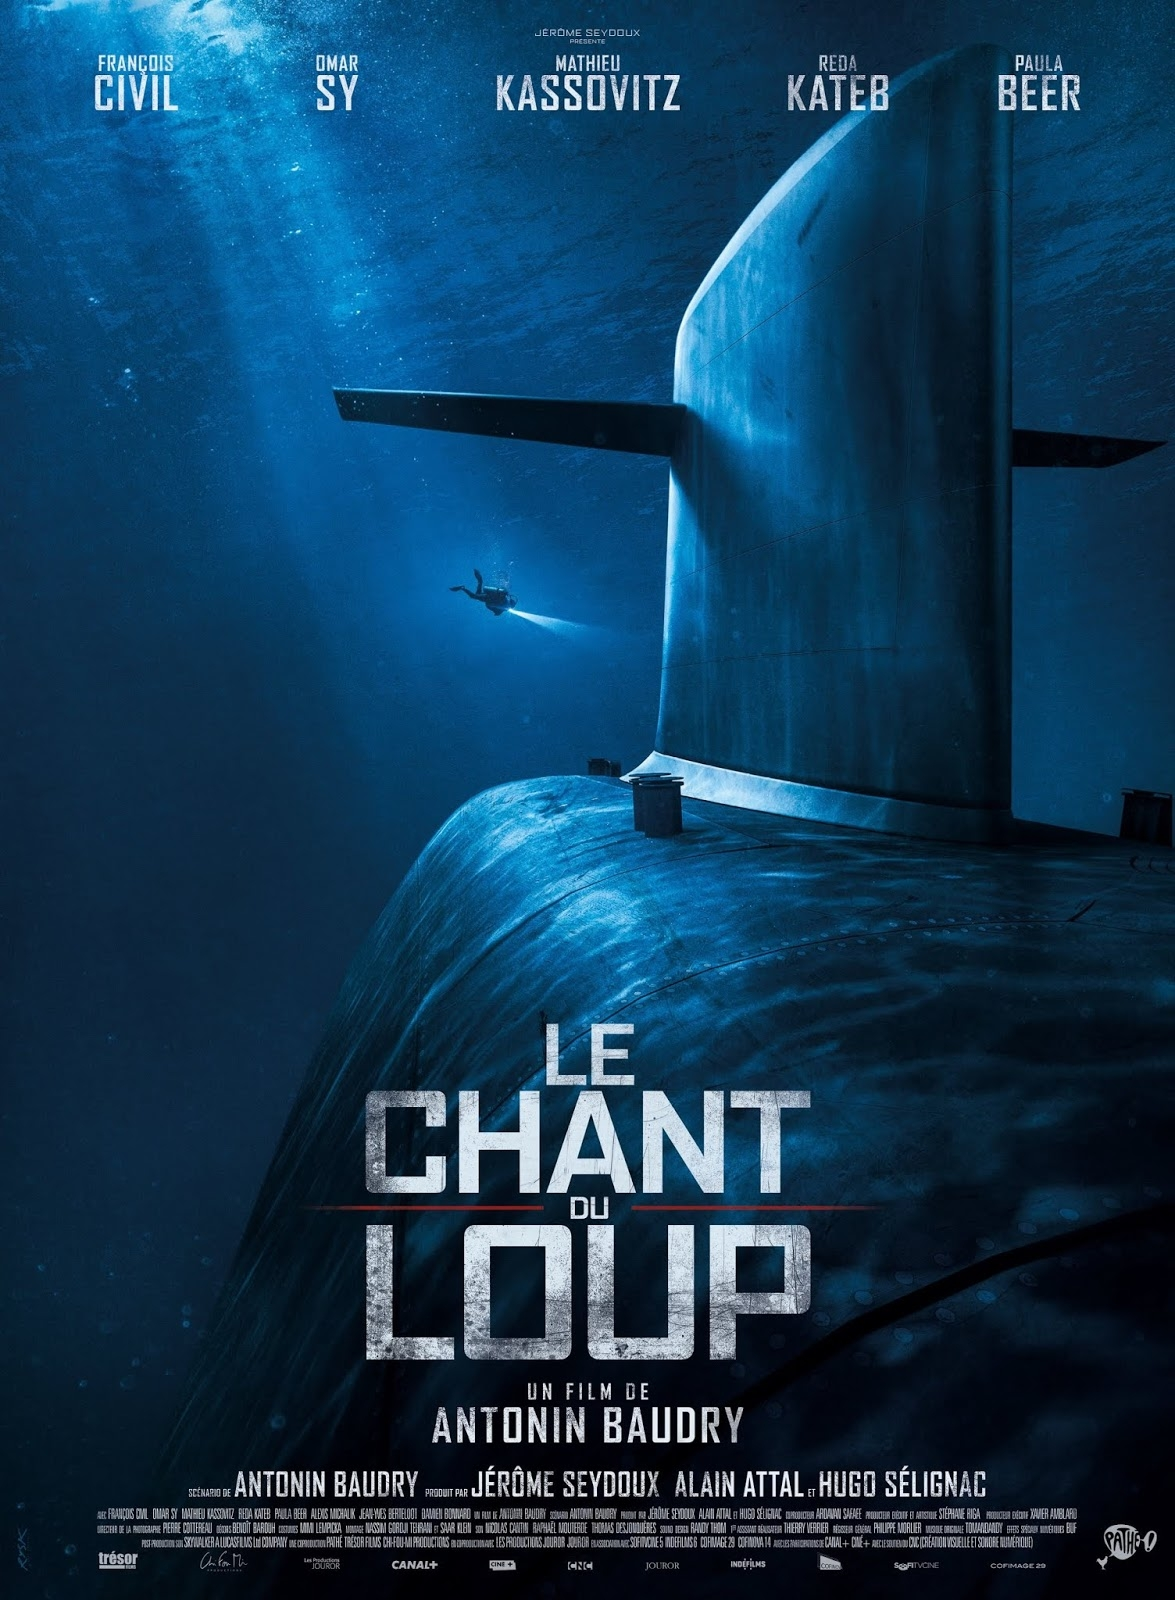 film, cinéma, 2019, le chant du loup, antonin baudry, mathieu kassovitz,omar sy, marine, sous-marin, pathé films